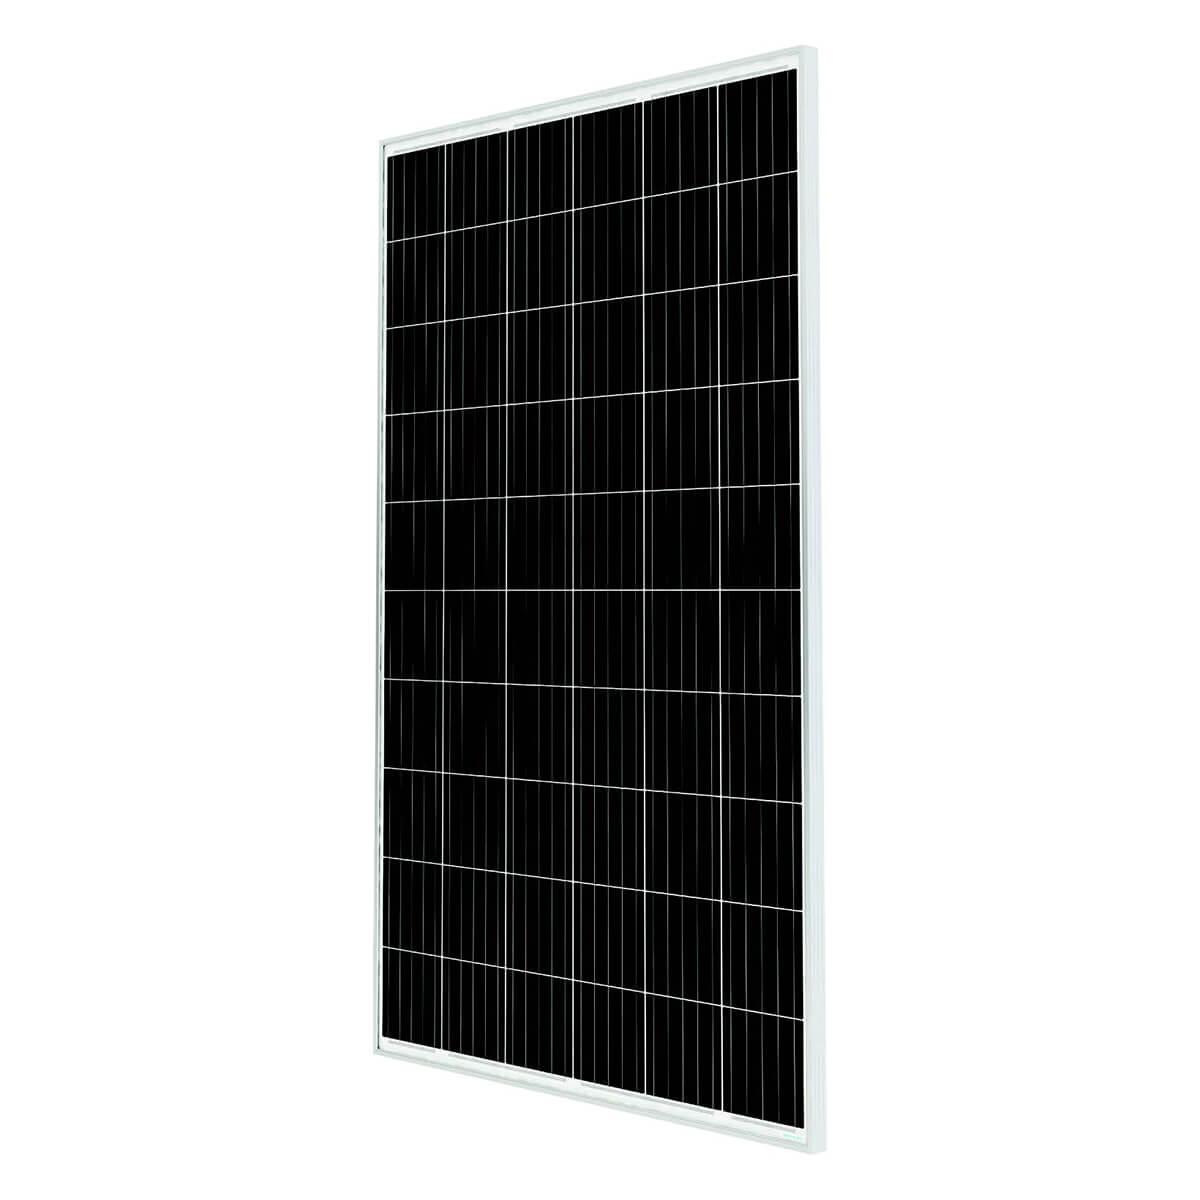 cw enerji 315W panel, cw enerji 315Watt panel, cw enerji 315 W panel, cw enerji 315 Watt panel, cw enerji 315 Watt monokristal panel, cw enerji 315 W watt gunes paneli, cw enerji 315 W watt monokristal gunes paneli, cw enerji 315 W Watt fotovoltaik monokristal solar panel, cw enerji 315W monokristal gunes enerjisi, cw enerji CWT315-60PM-315W panel, CW Enerji 315 WATT